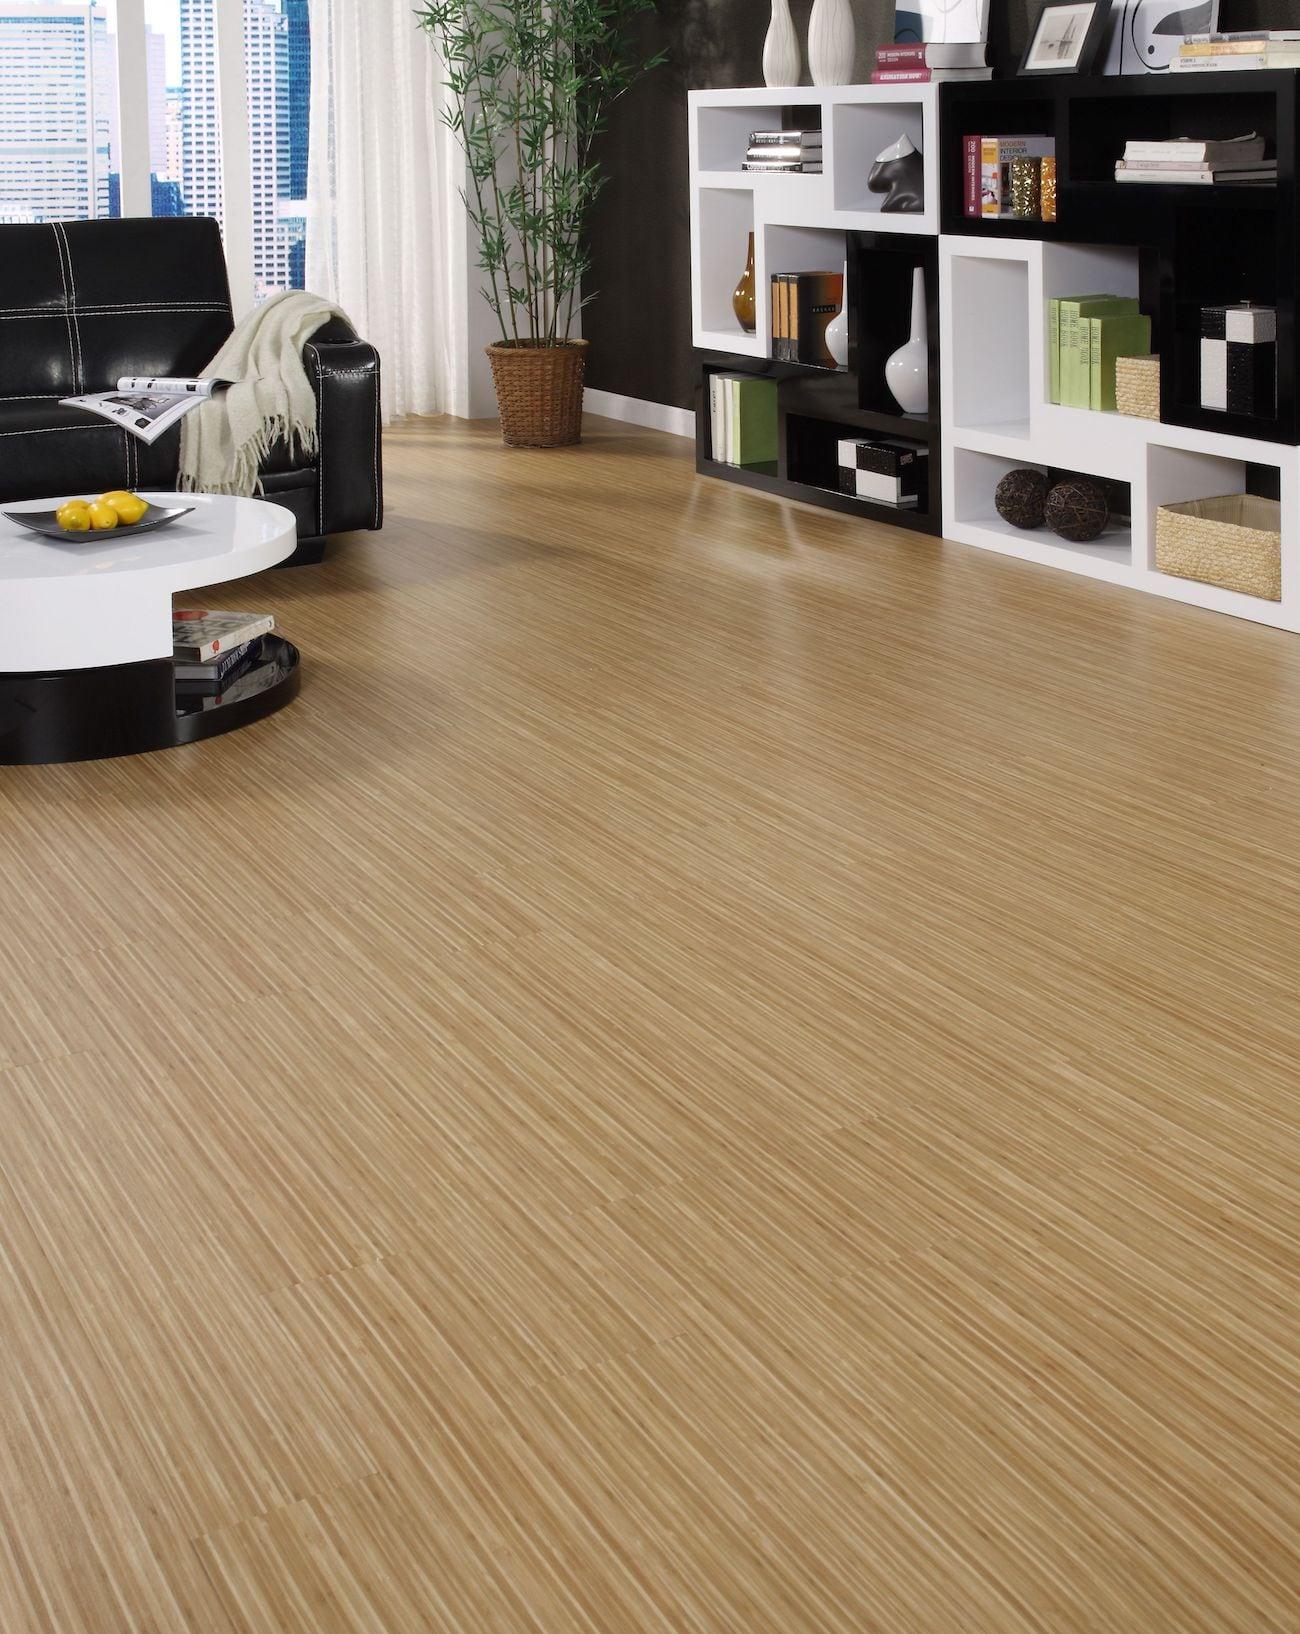 Freefit Loose Lay Vinyl Plank Flooring